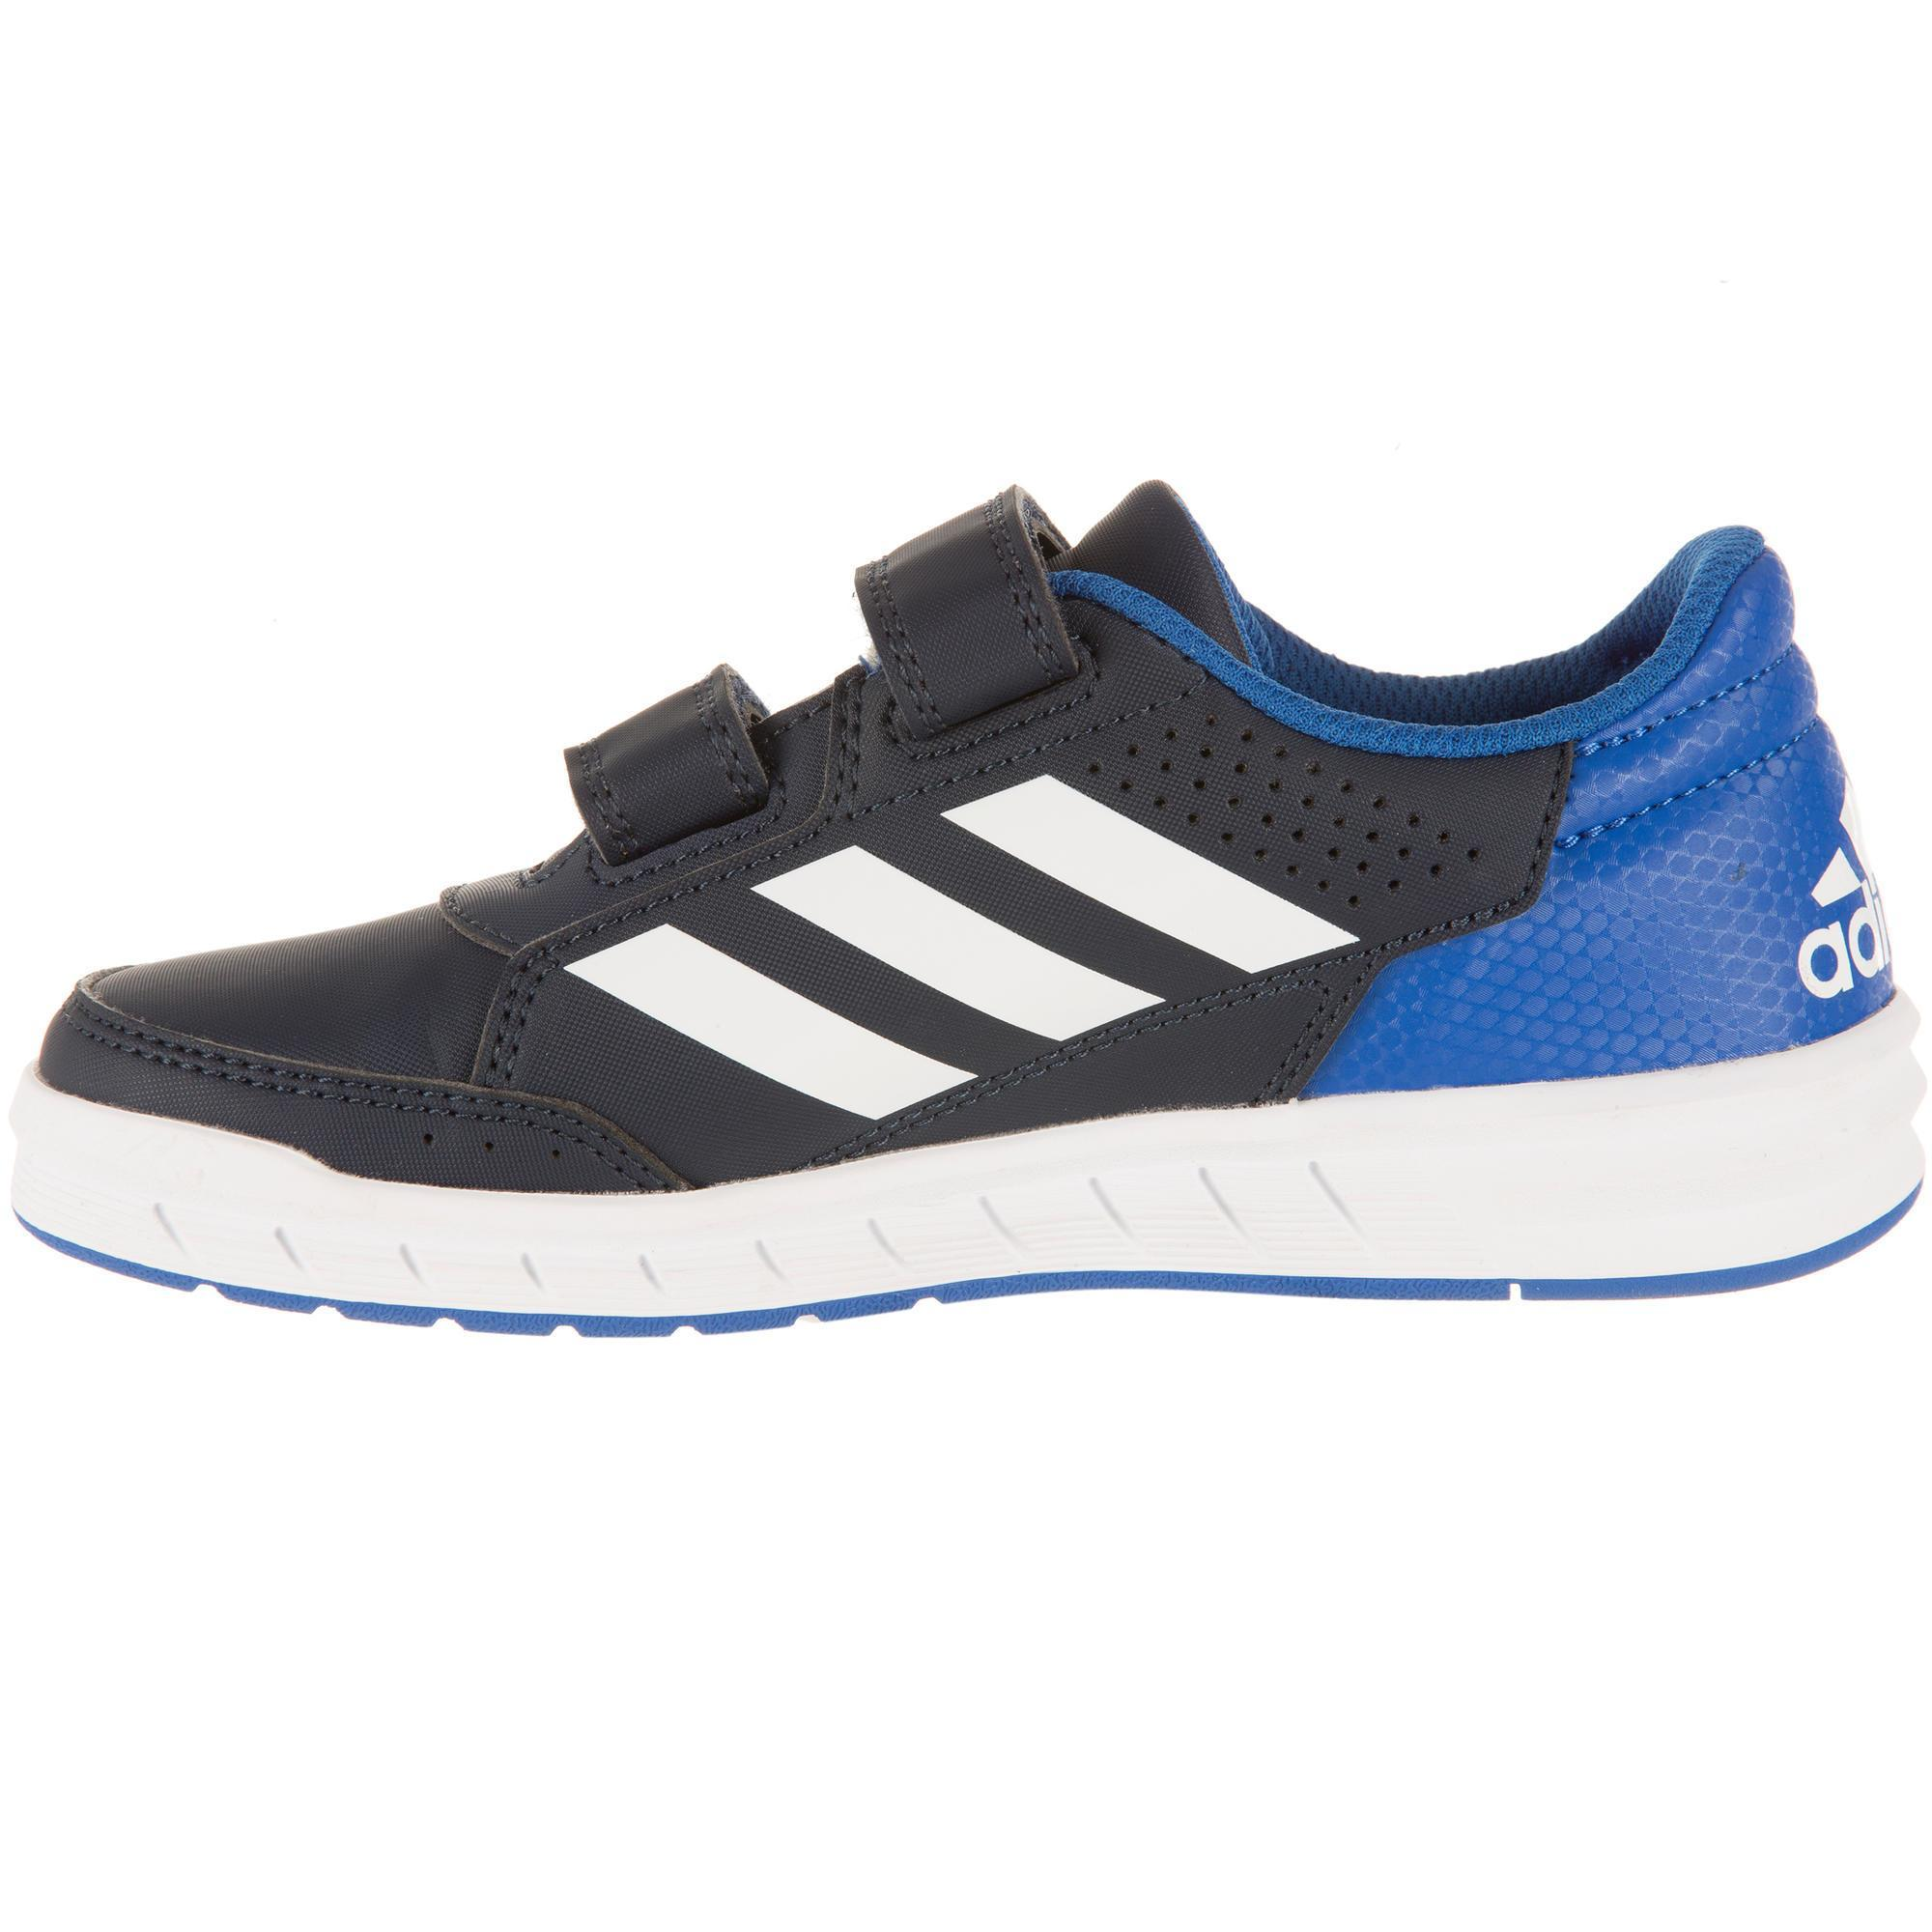 huge discount dc056 a688d Tennis Enfant Bleu Chaussures Decathlon Adidas Altasport De ...